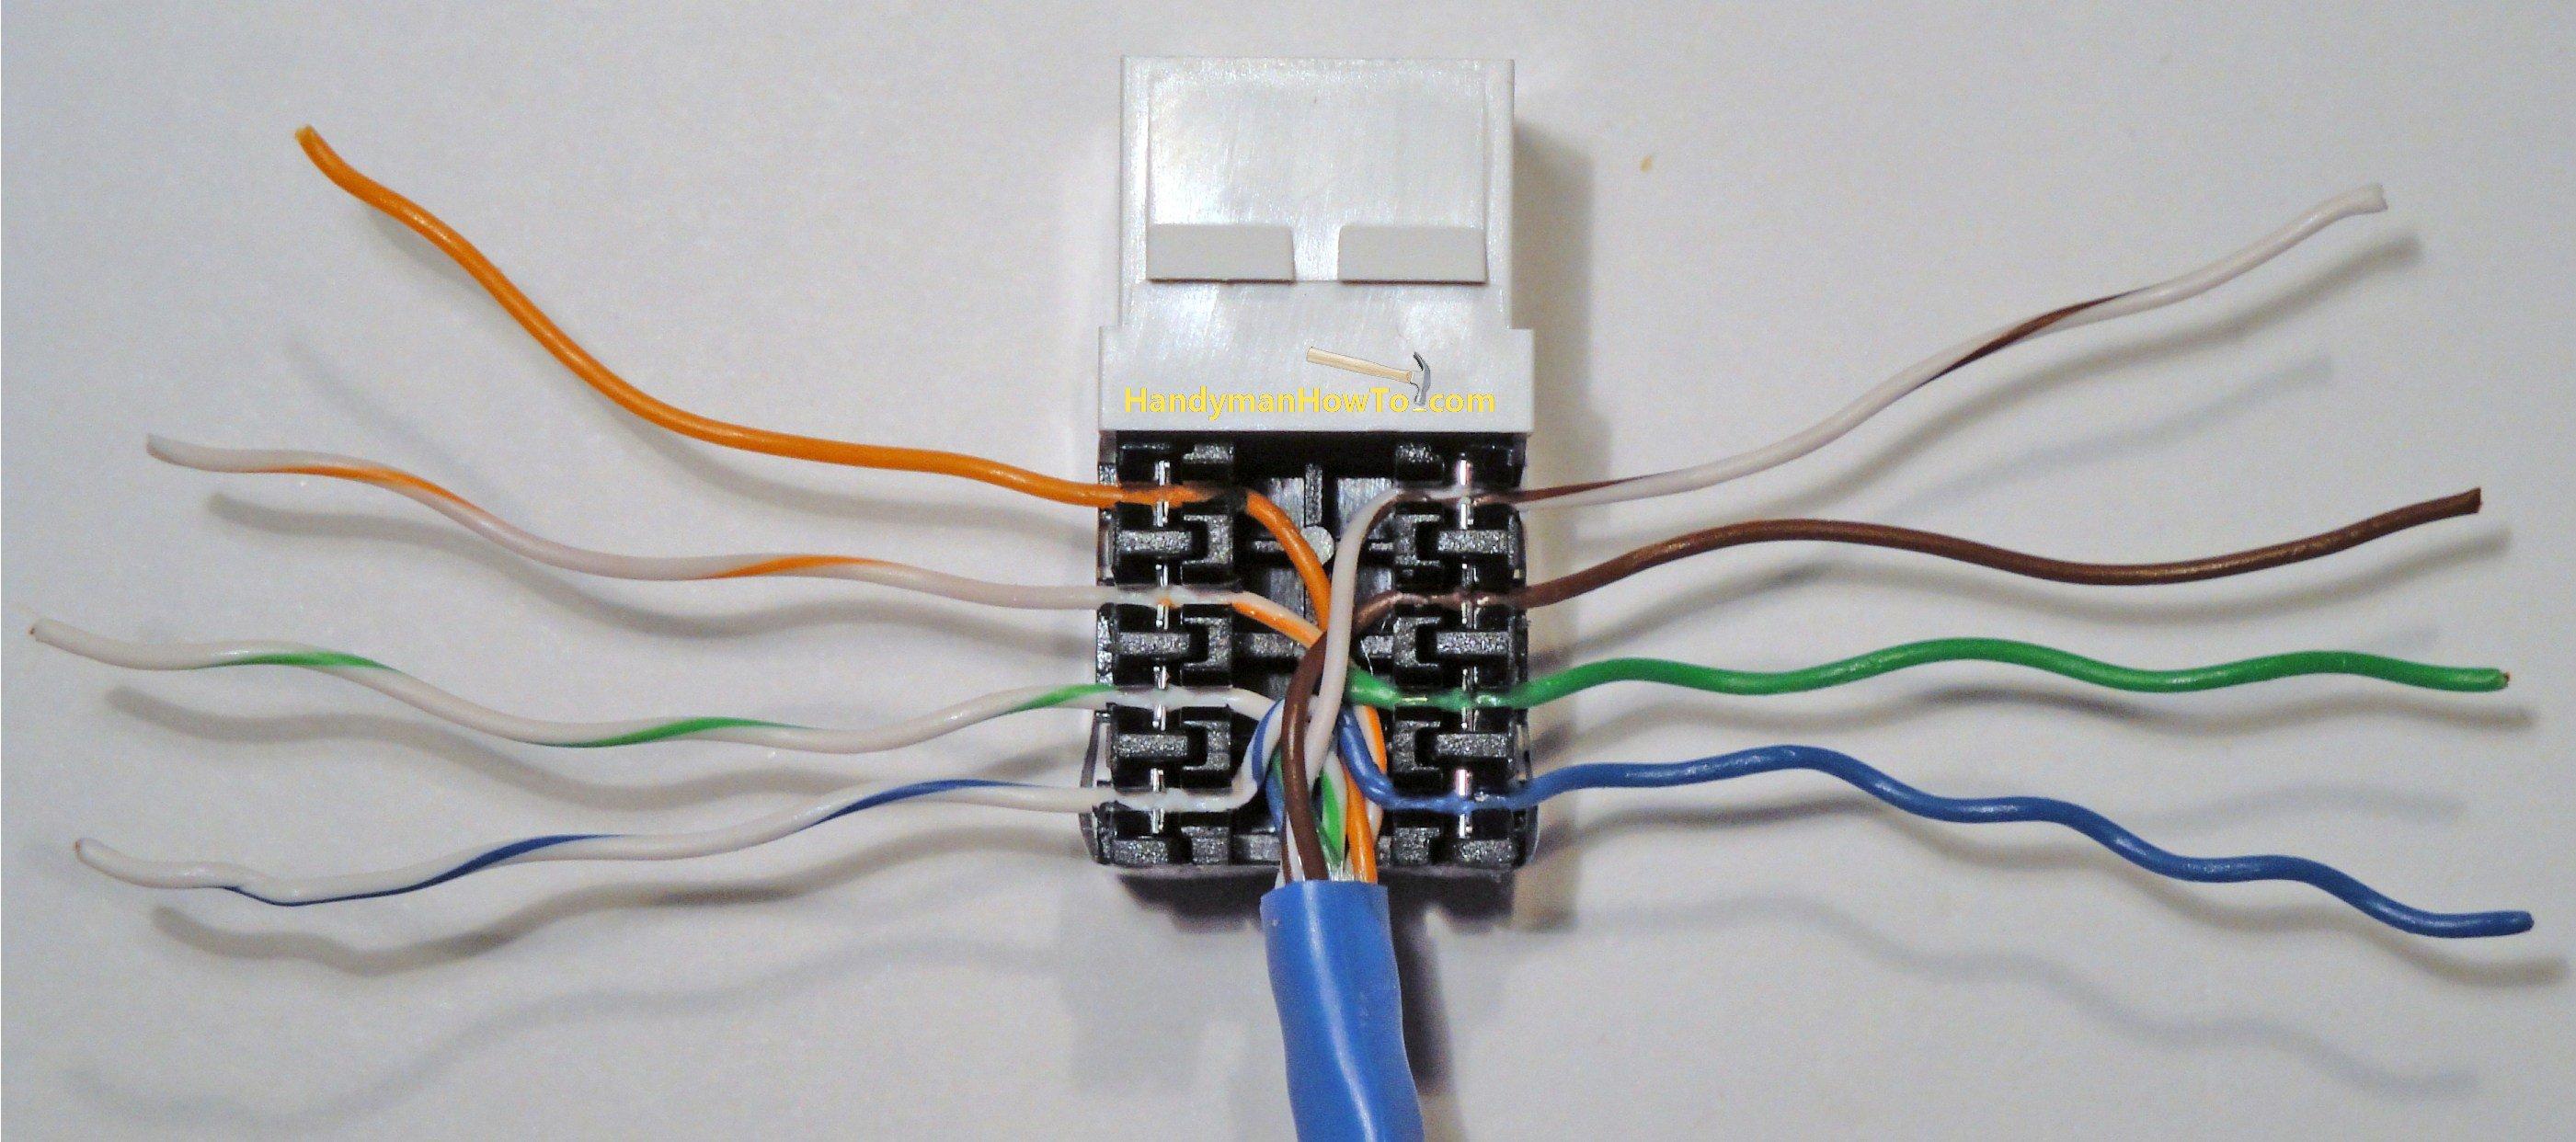 Cat5E Wiring Diagram Wall Plate | Wiring Diagram - Cat5E Wiring Diagram Wall Plate